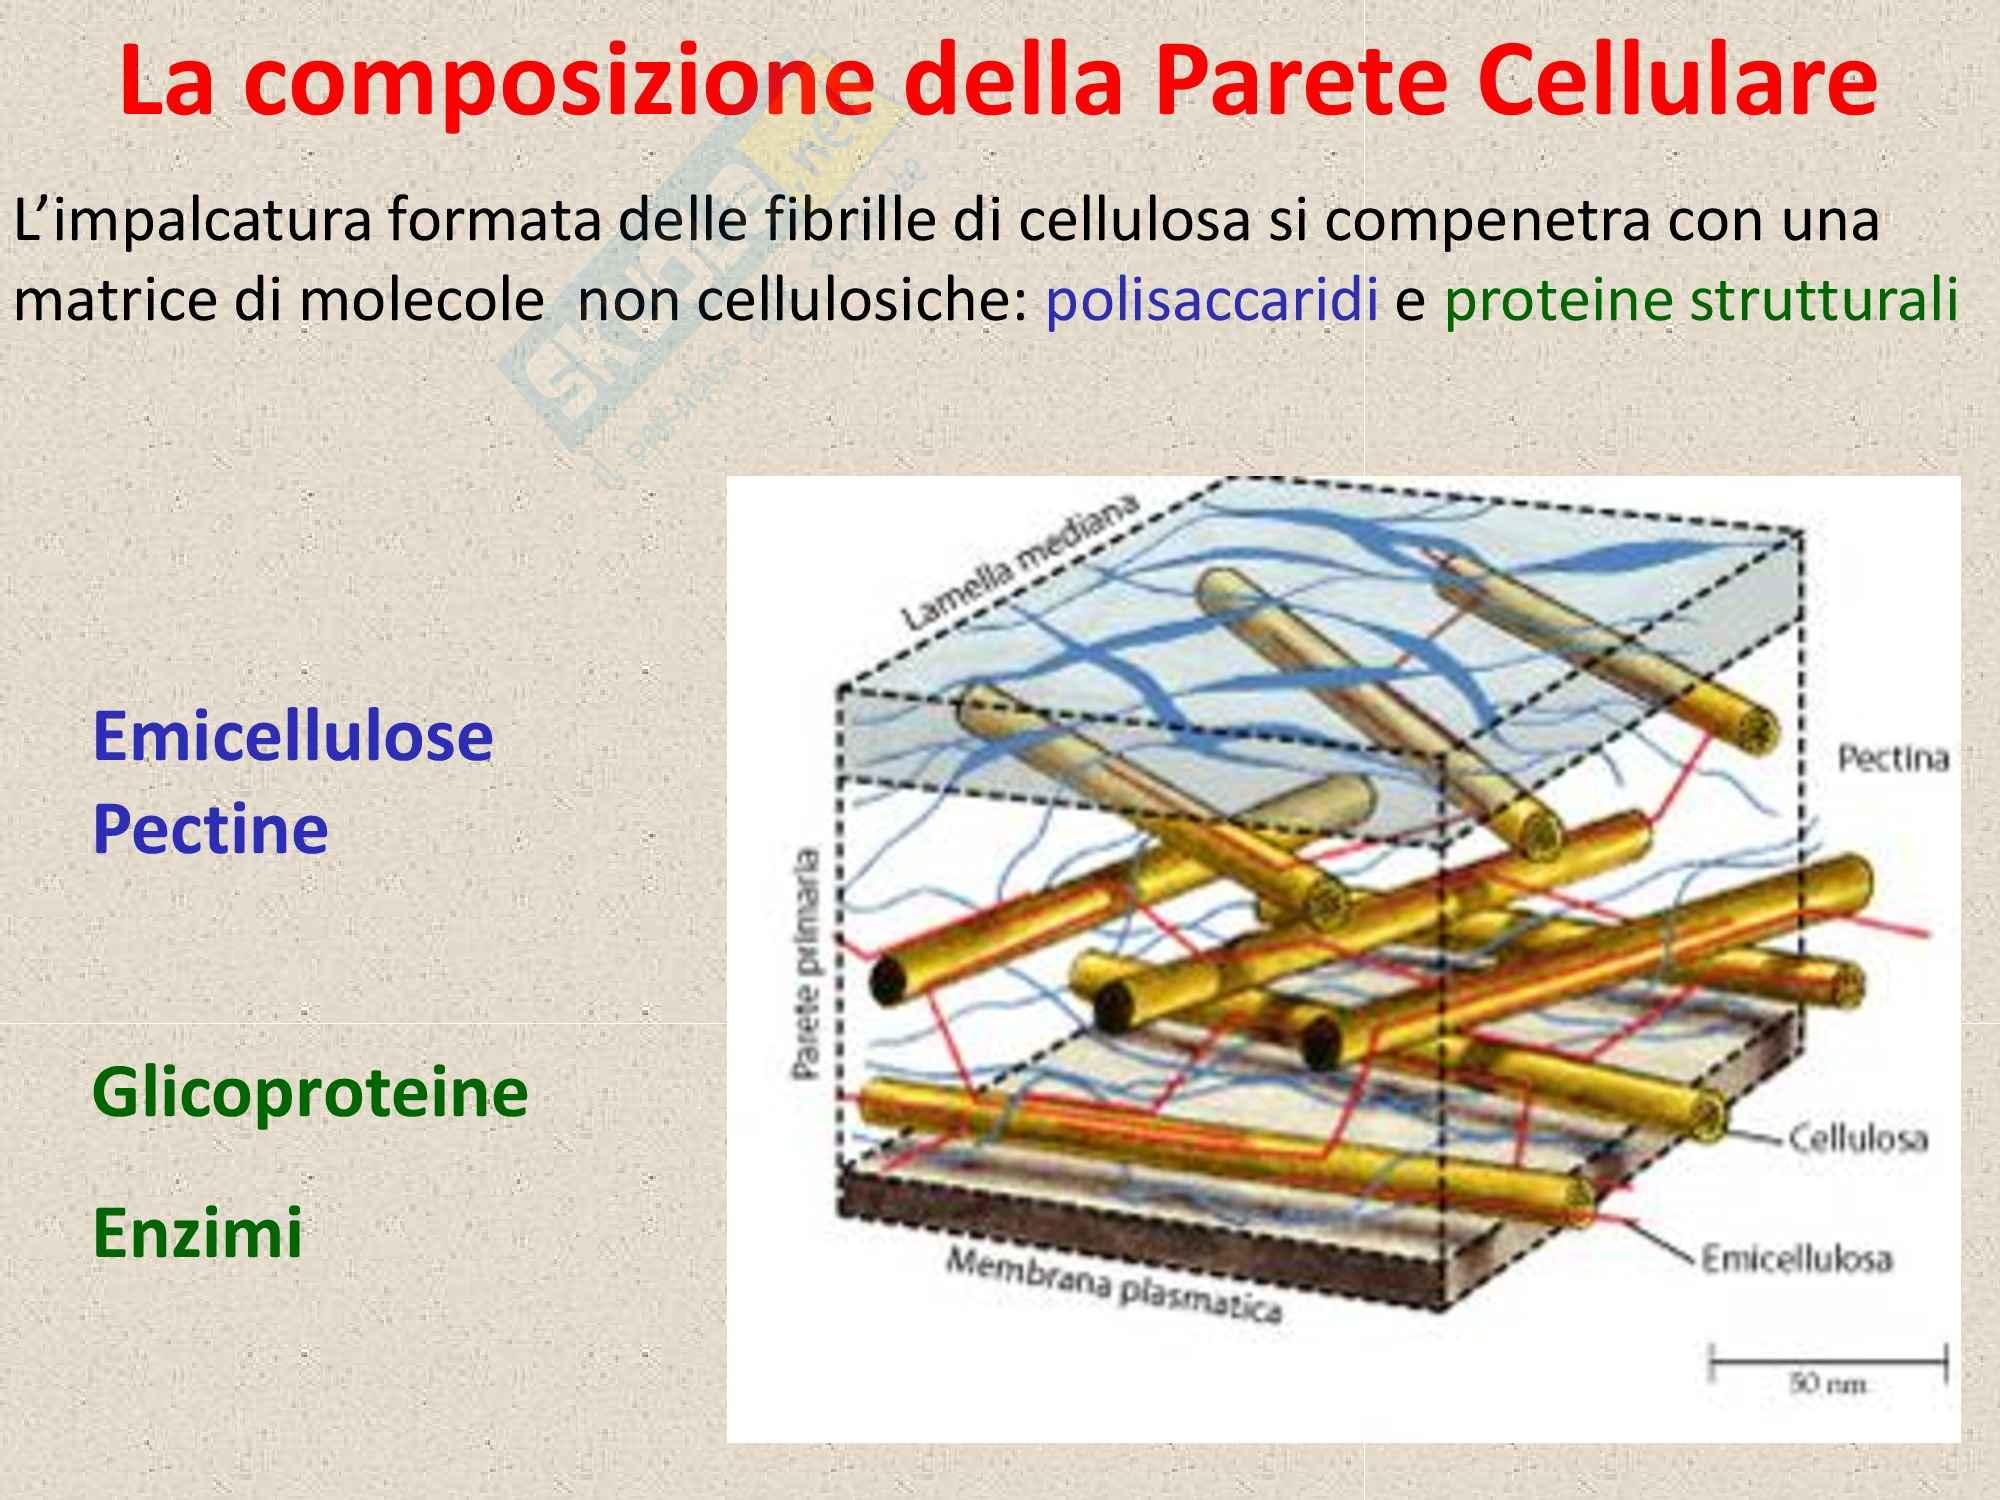 Biologia vegetale - parete cellulare Pag. 6